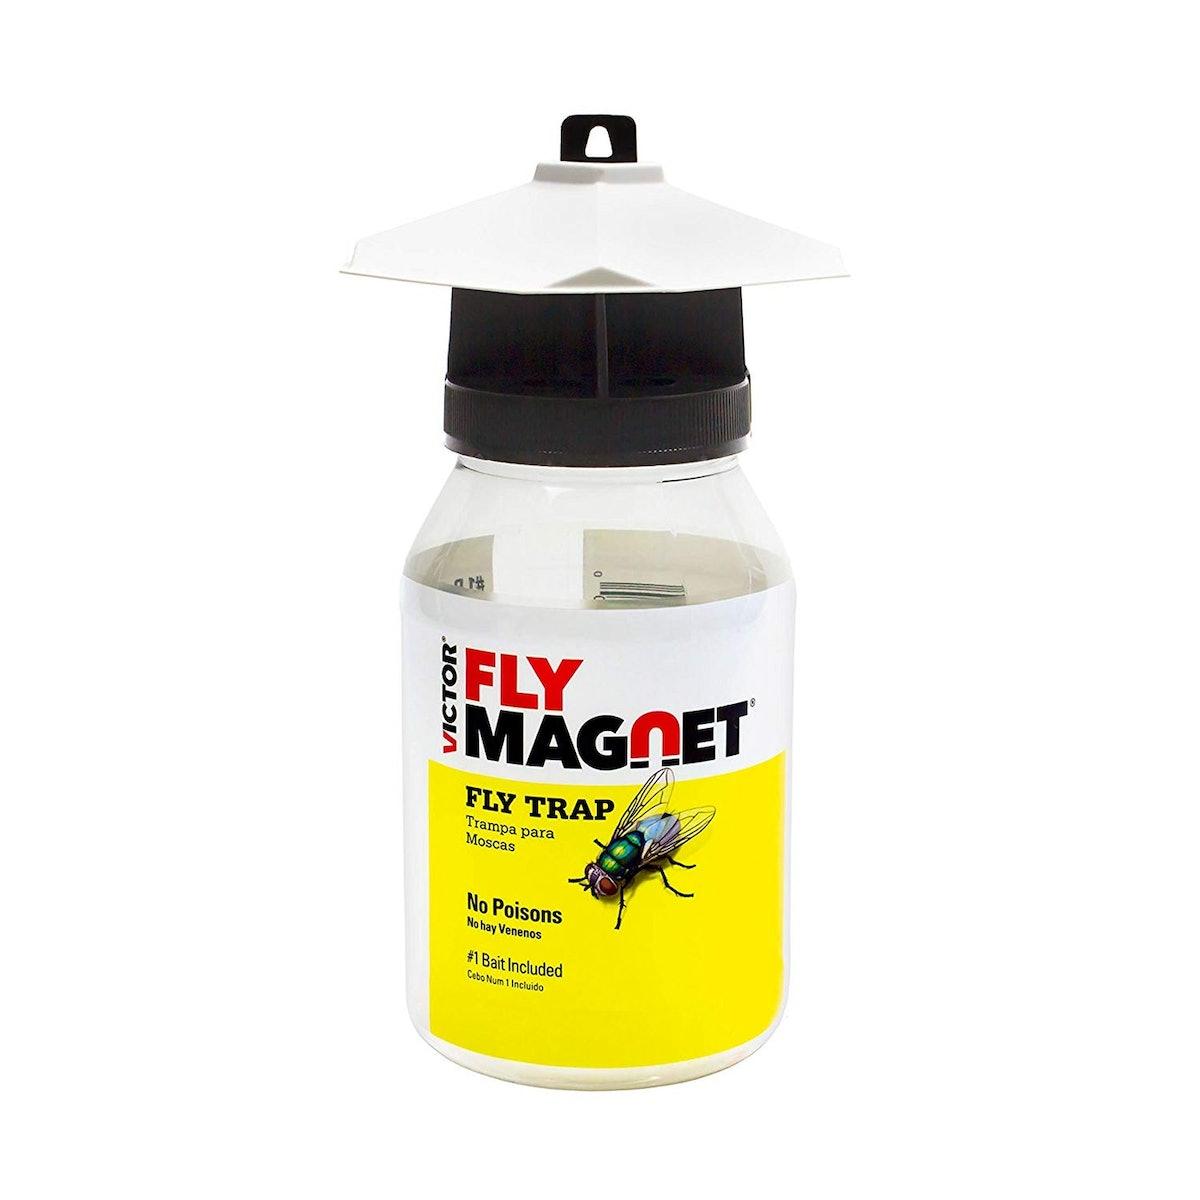 Safer Brand Fly Magnet